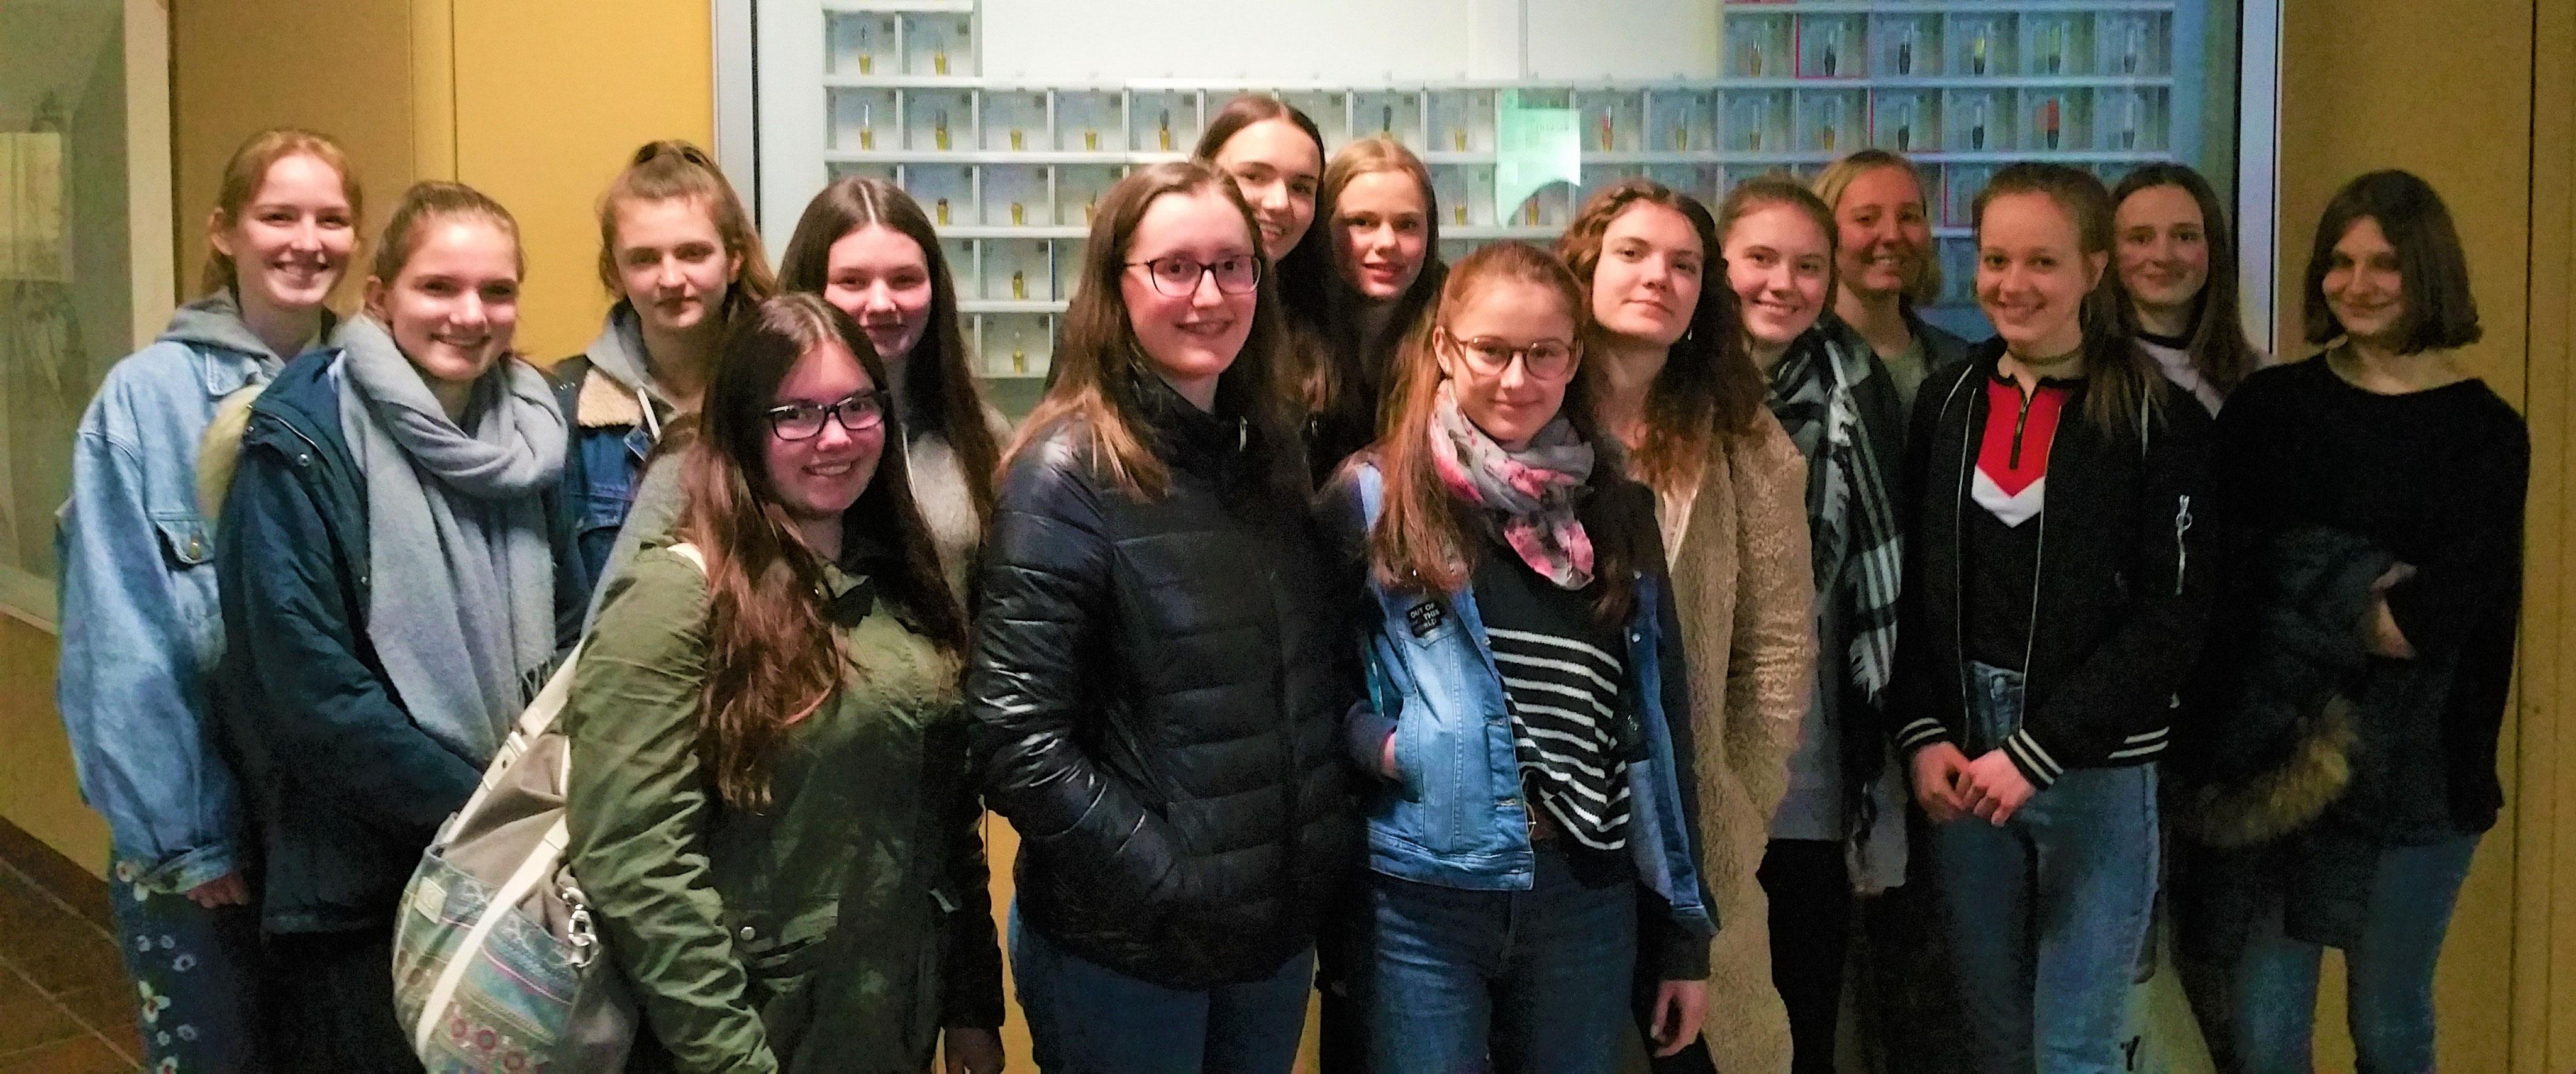 Forschung und Technik hautnah - Mädchenrealschule ...